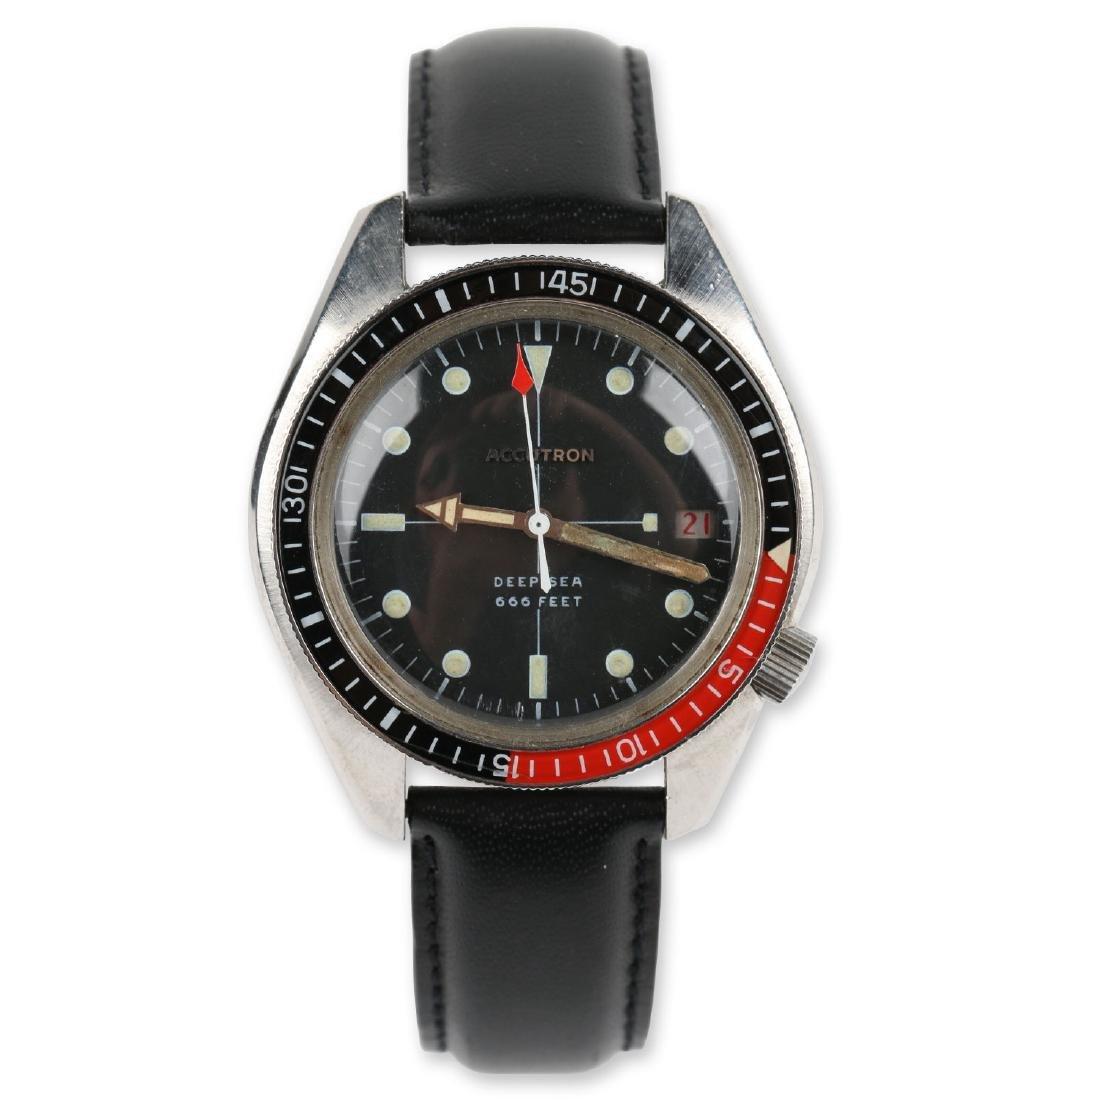 "Bulova Accutron ""Deep Sea"" 666ft Diver's Wristwatch"